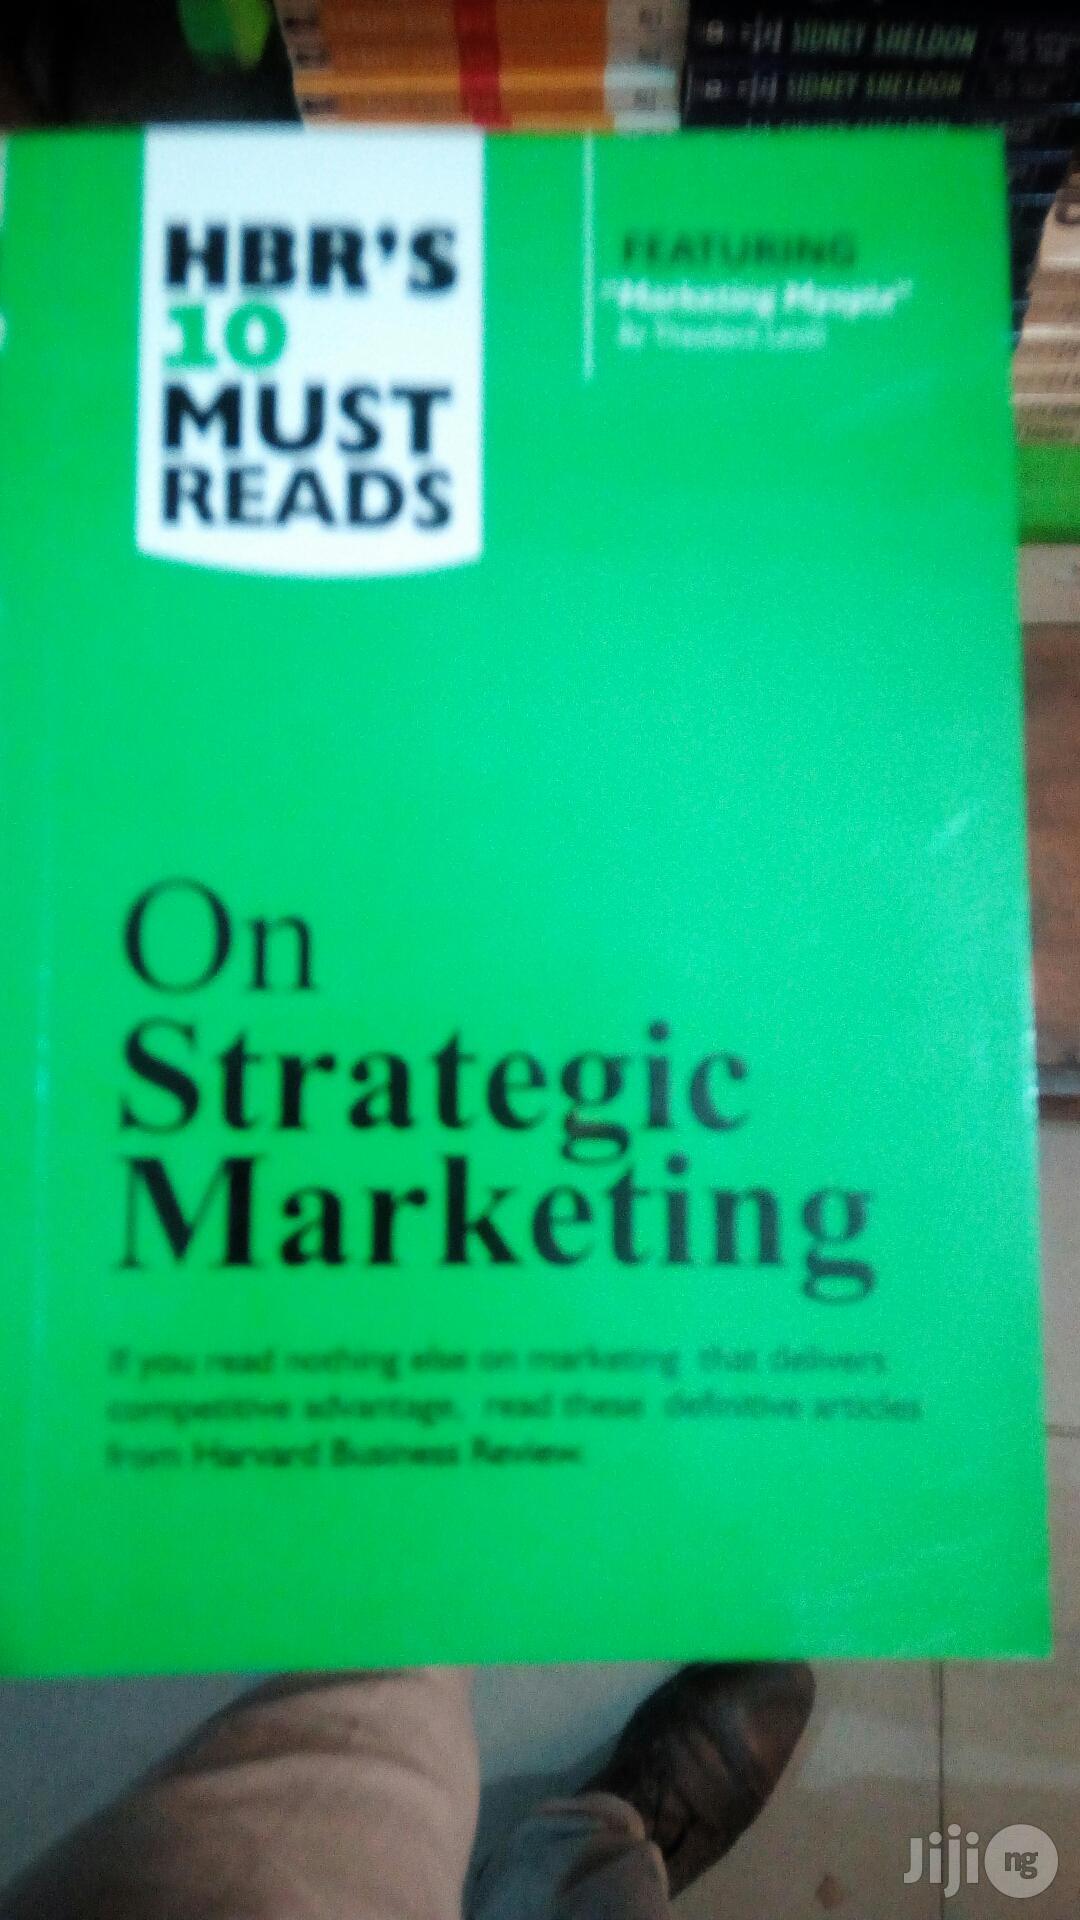 Hbr on Marketing Strategy